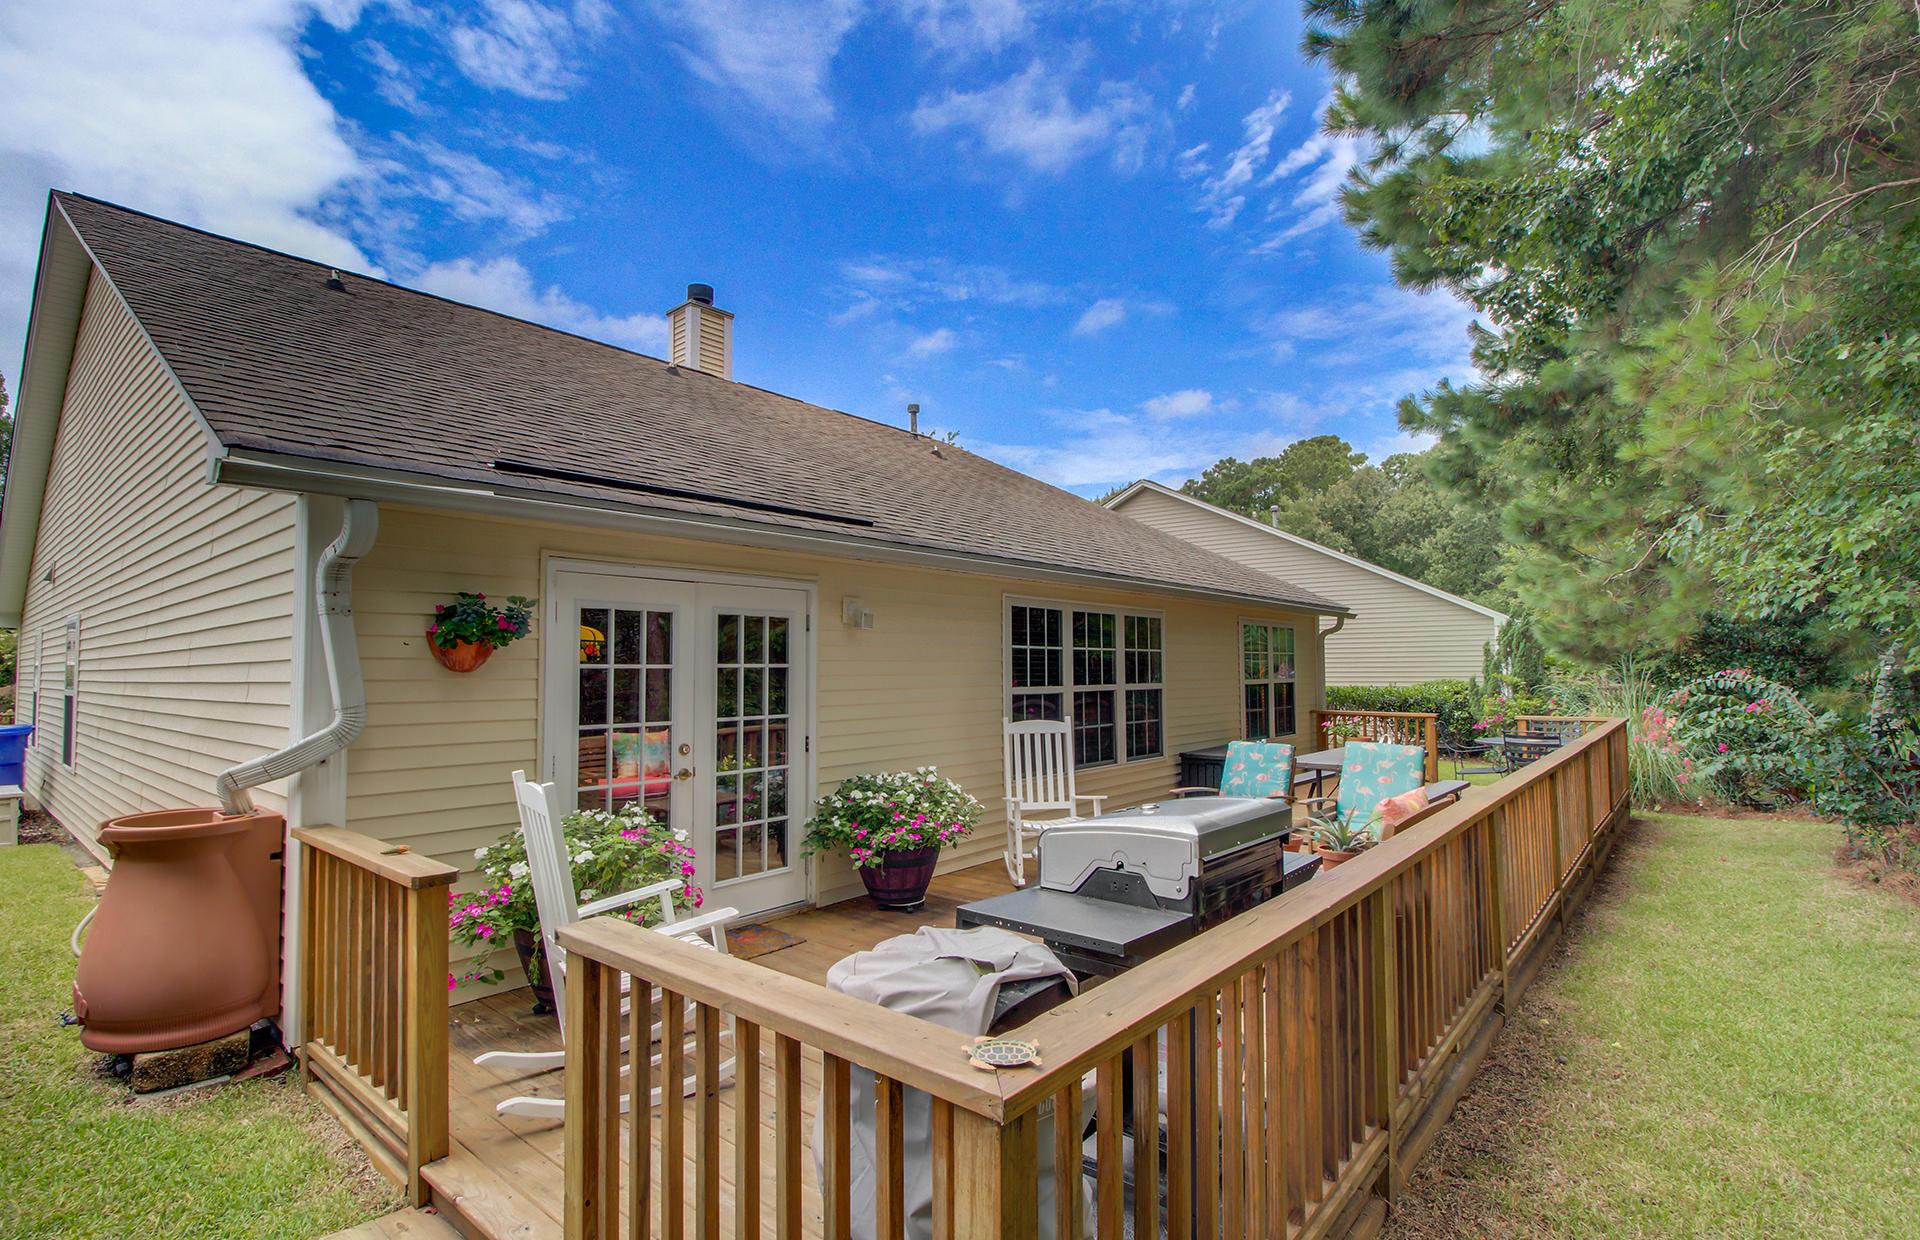 Park West Homes For Sale - 1500 Wellesley, Mount Pleasant, SC - 18